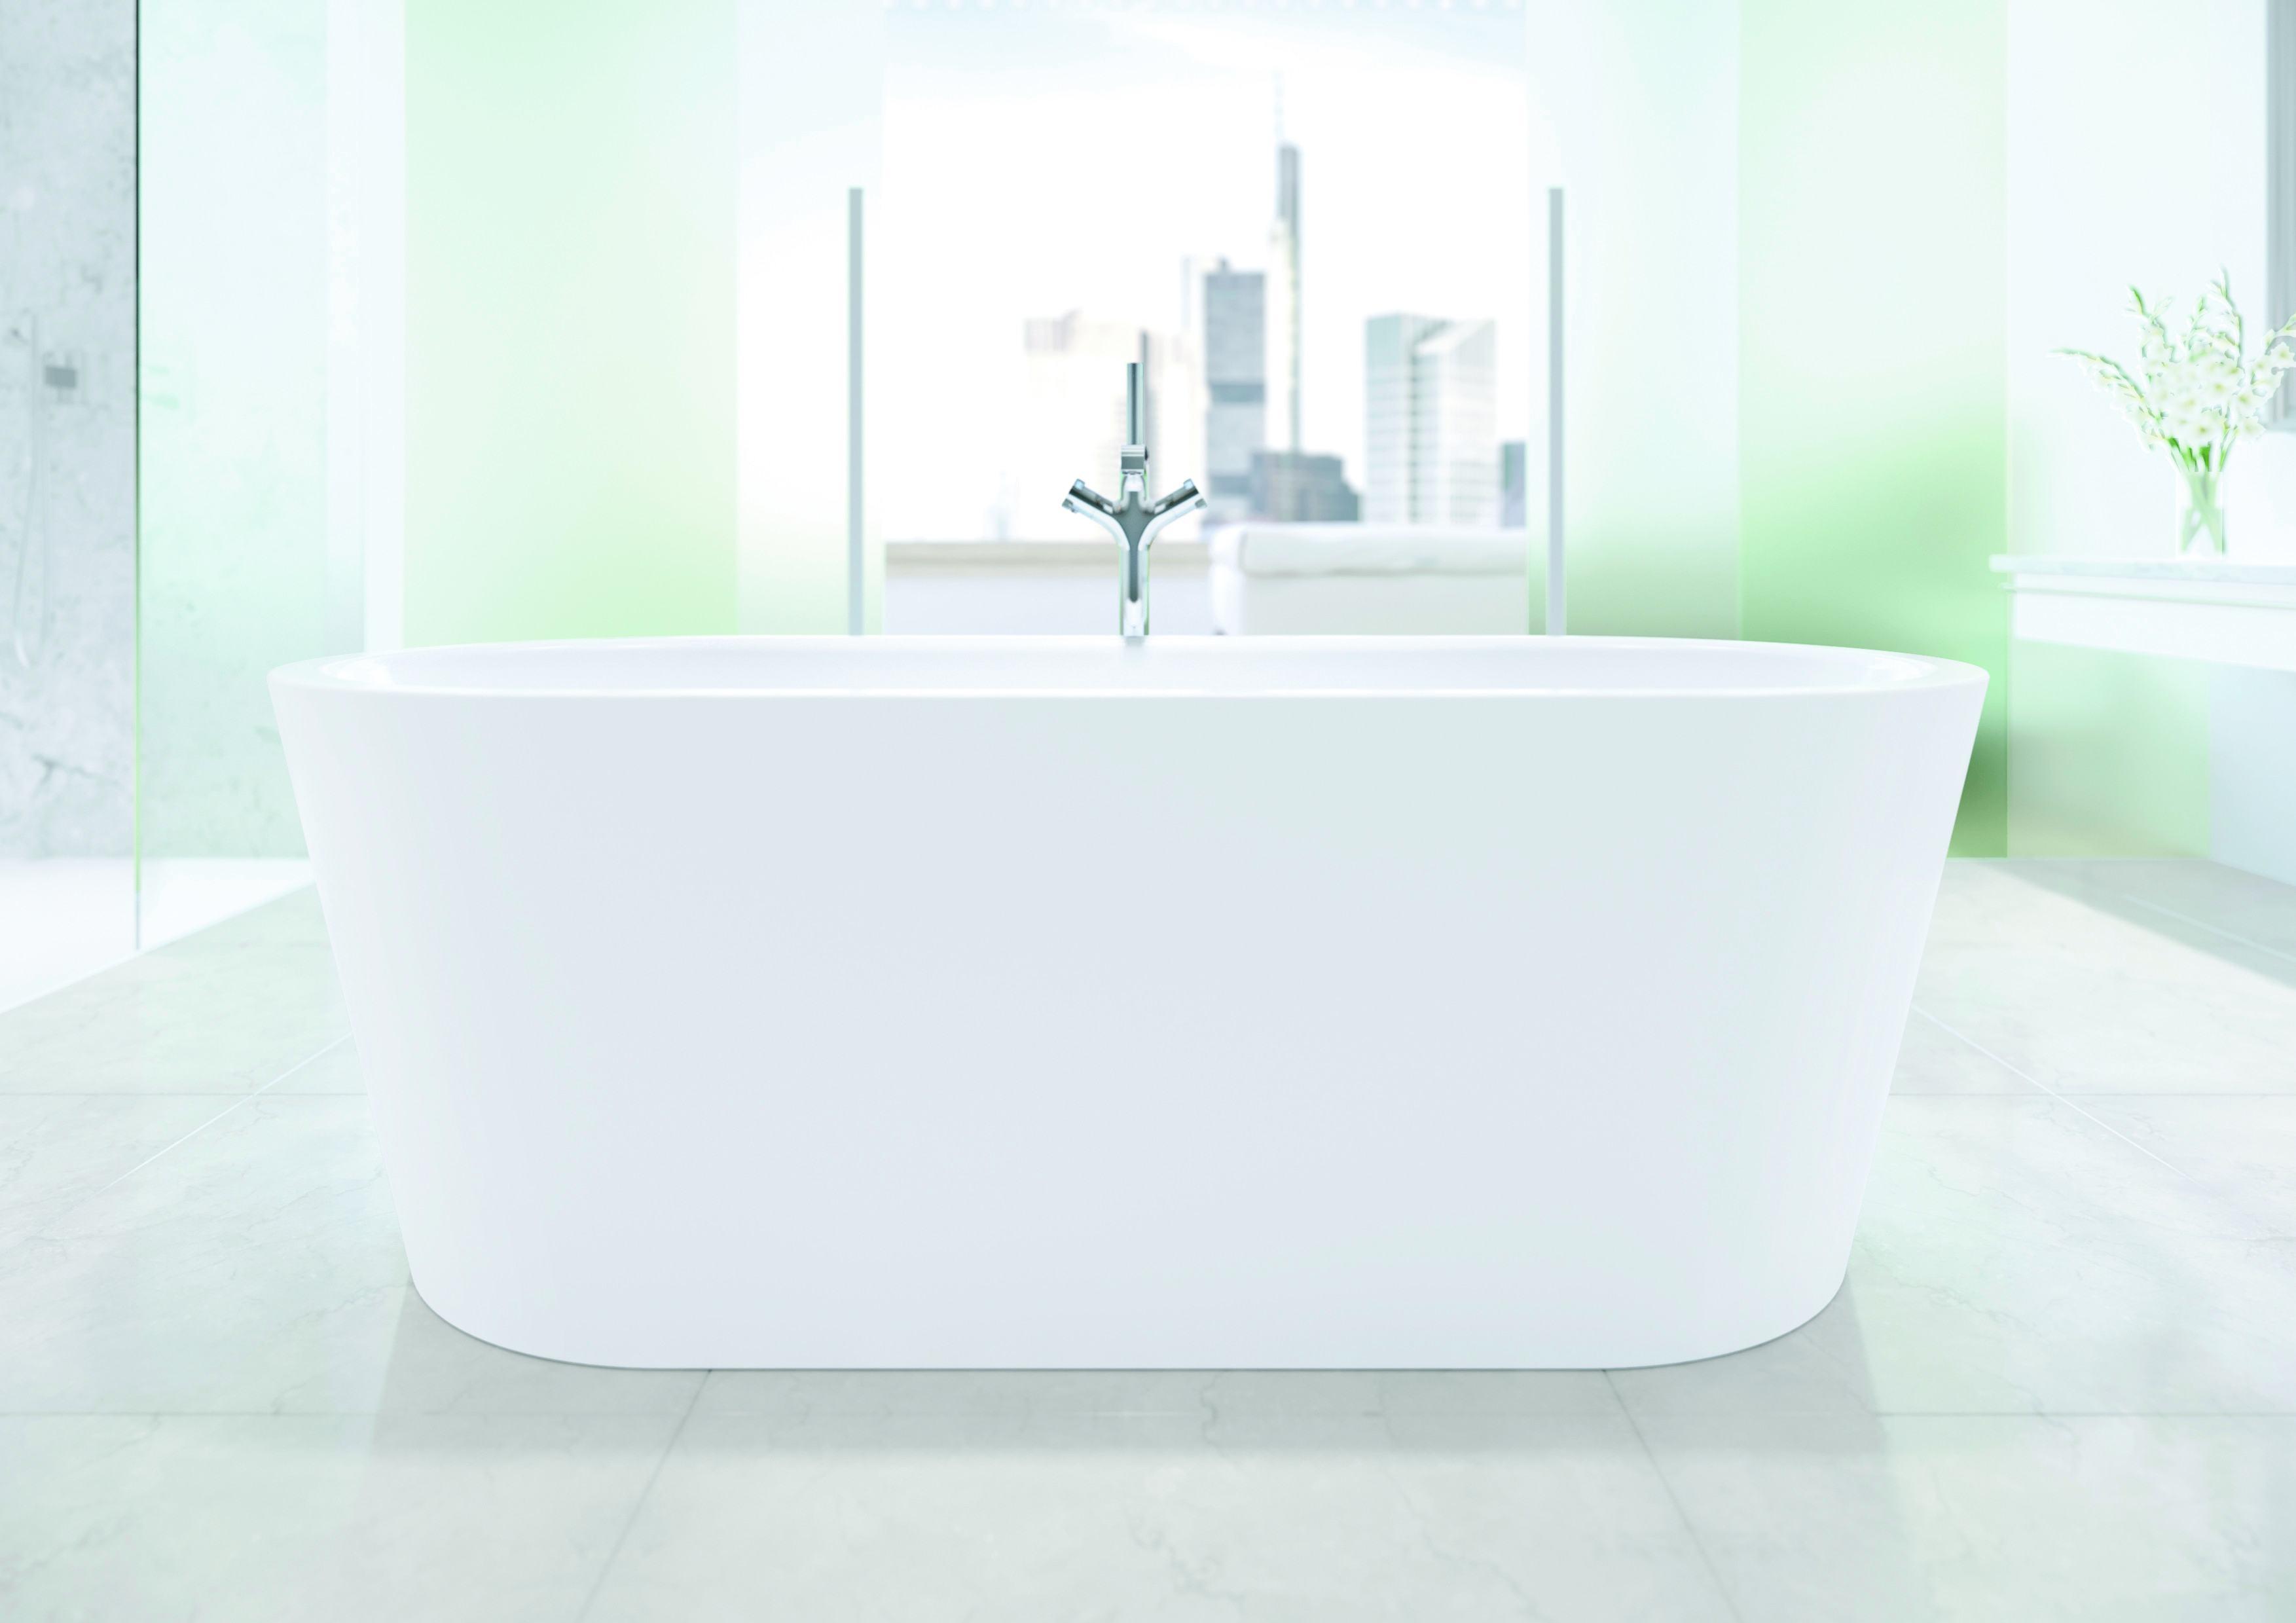 meisterst ck classic duo oval de kaldewei concept bain. Black Bedroom Furniture Sets. Home Design Ideas